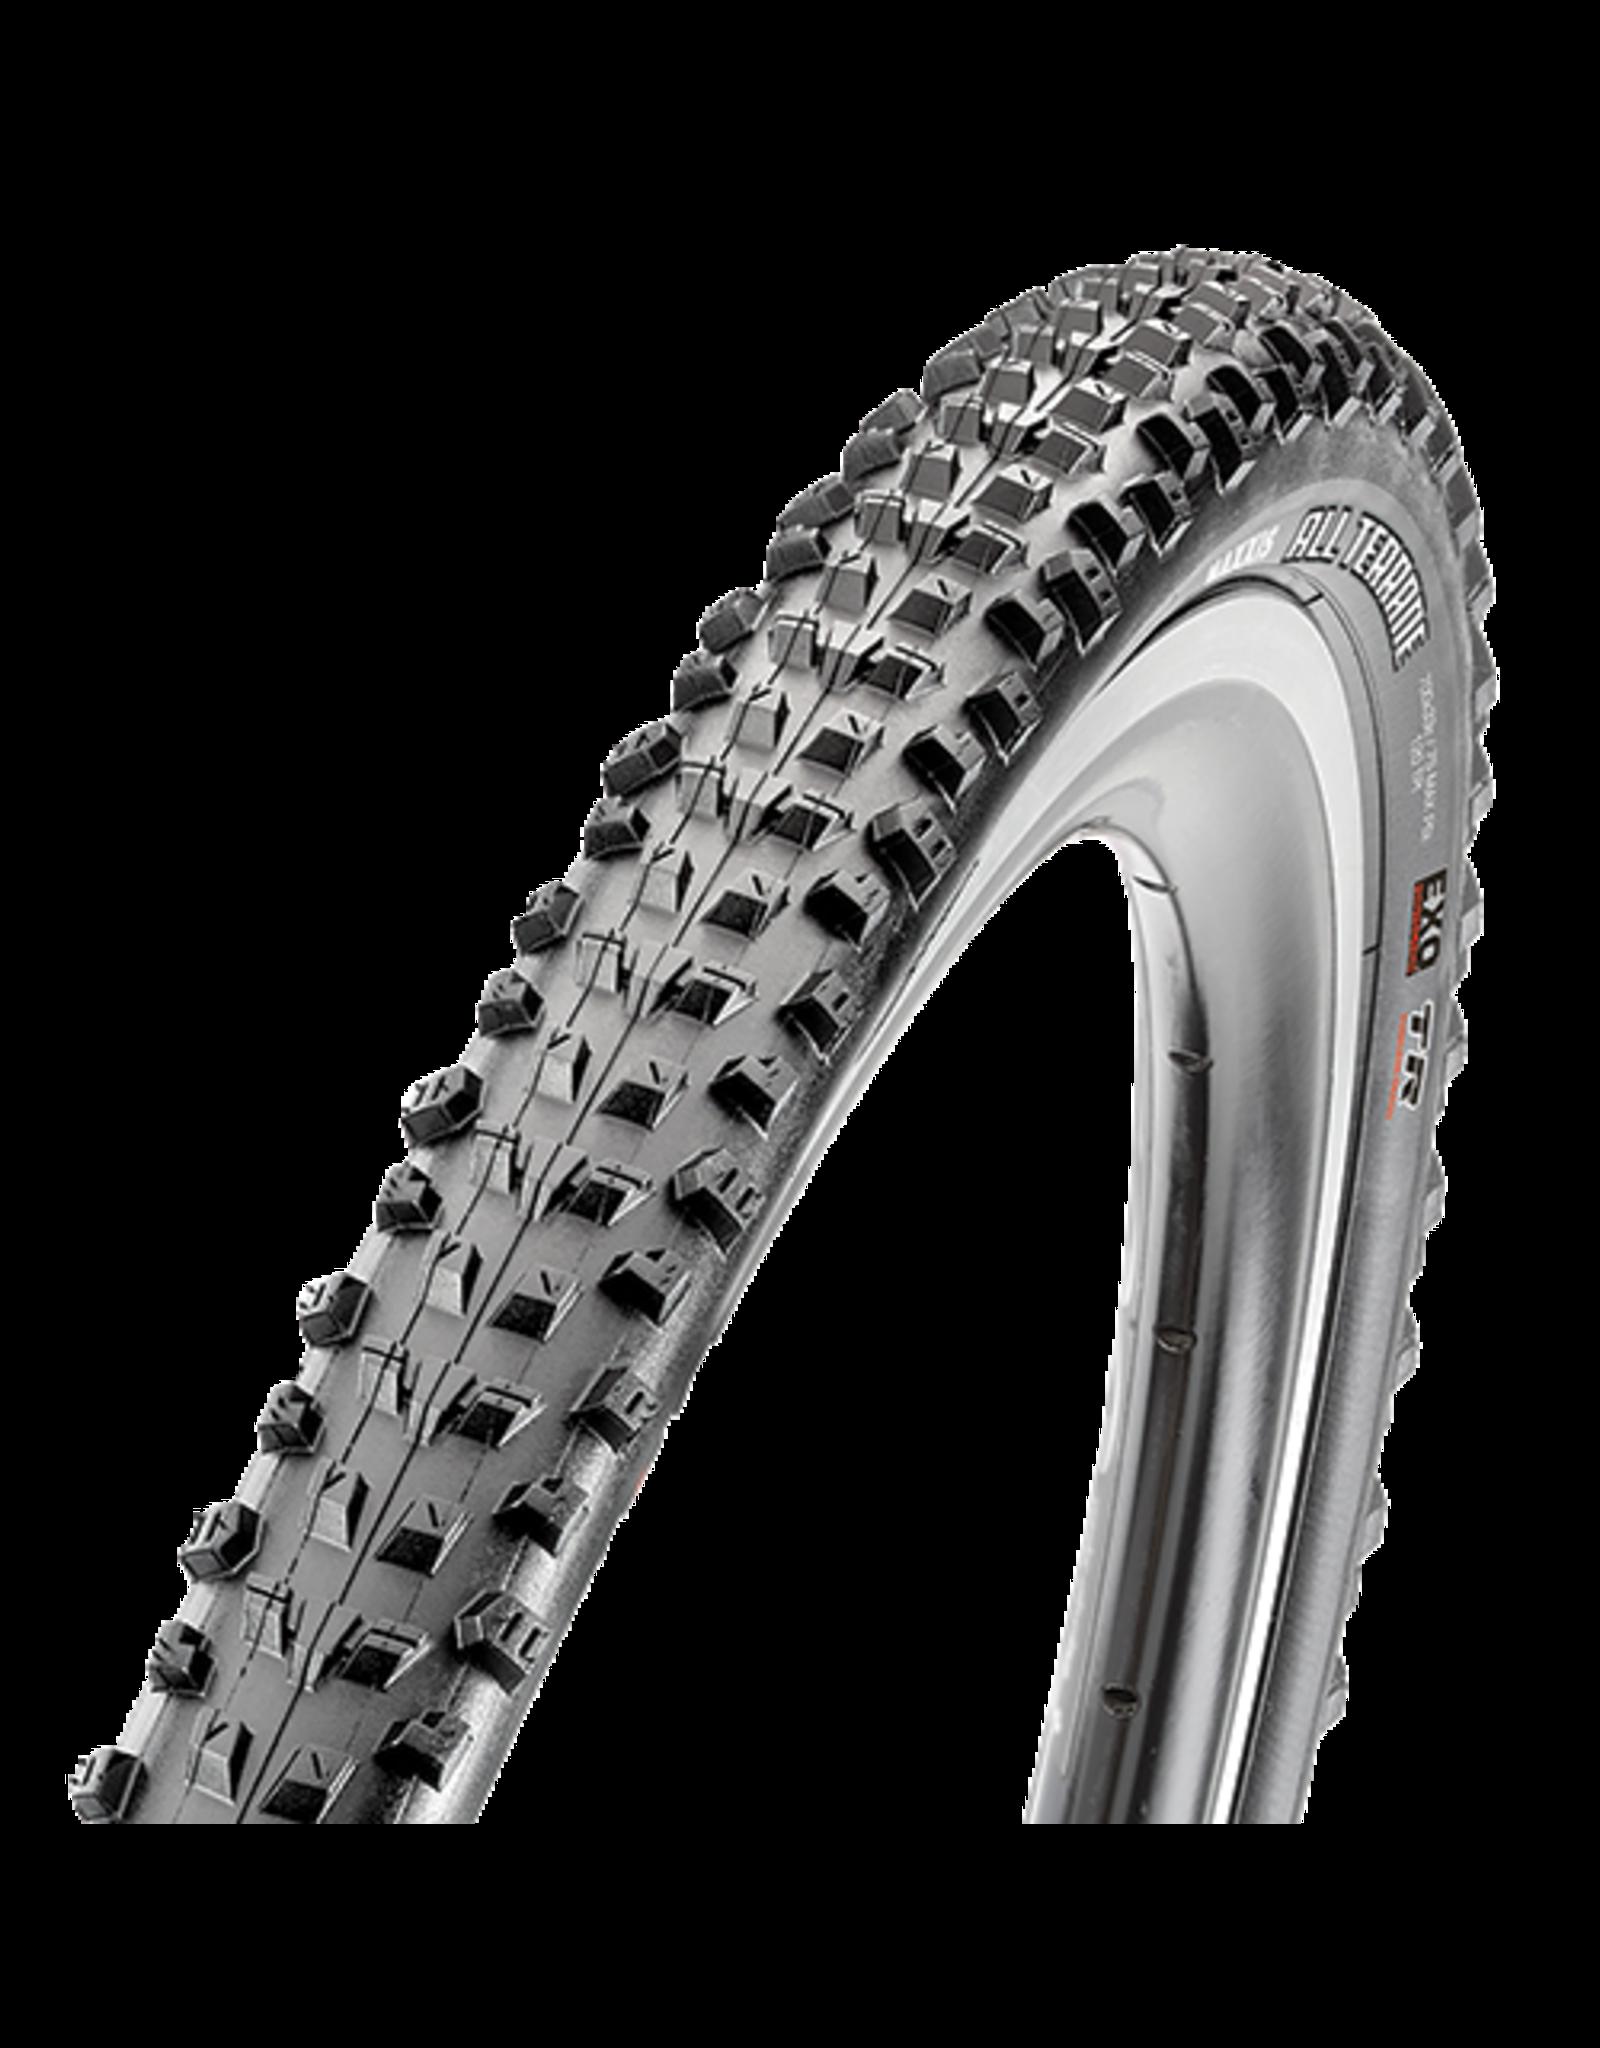 Maxxis All Terrane Tire - 700 x 33, Folding, Tubeless, Black, Dual, EXO, 120tpi